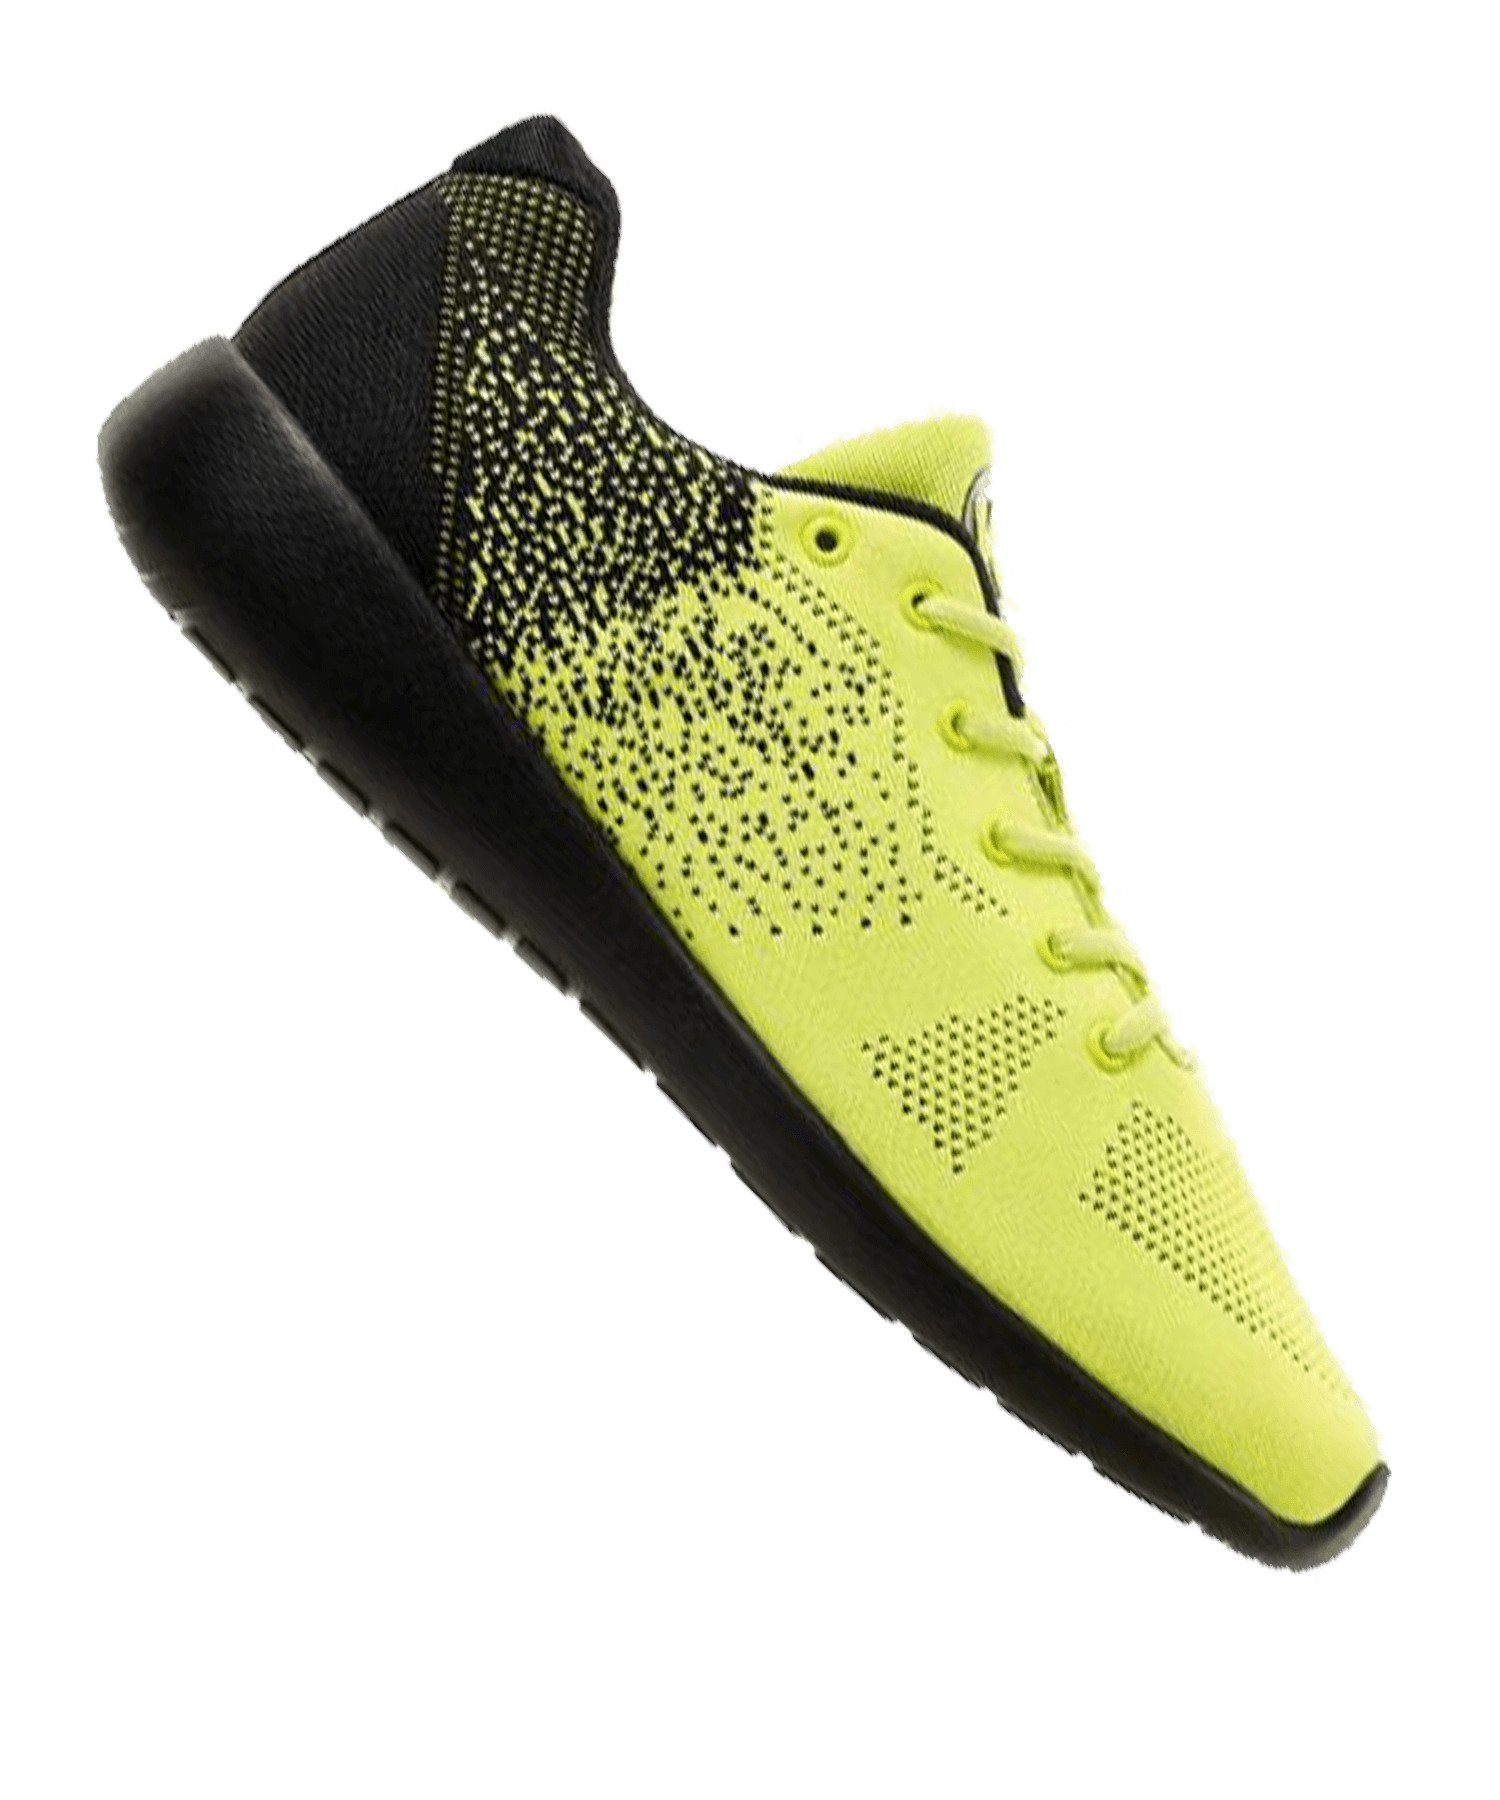 Spezialangebot Converse Sneaker Low All Star Schuhe Jute